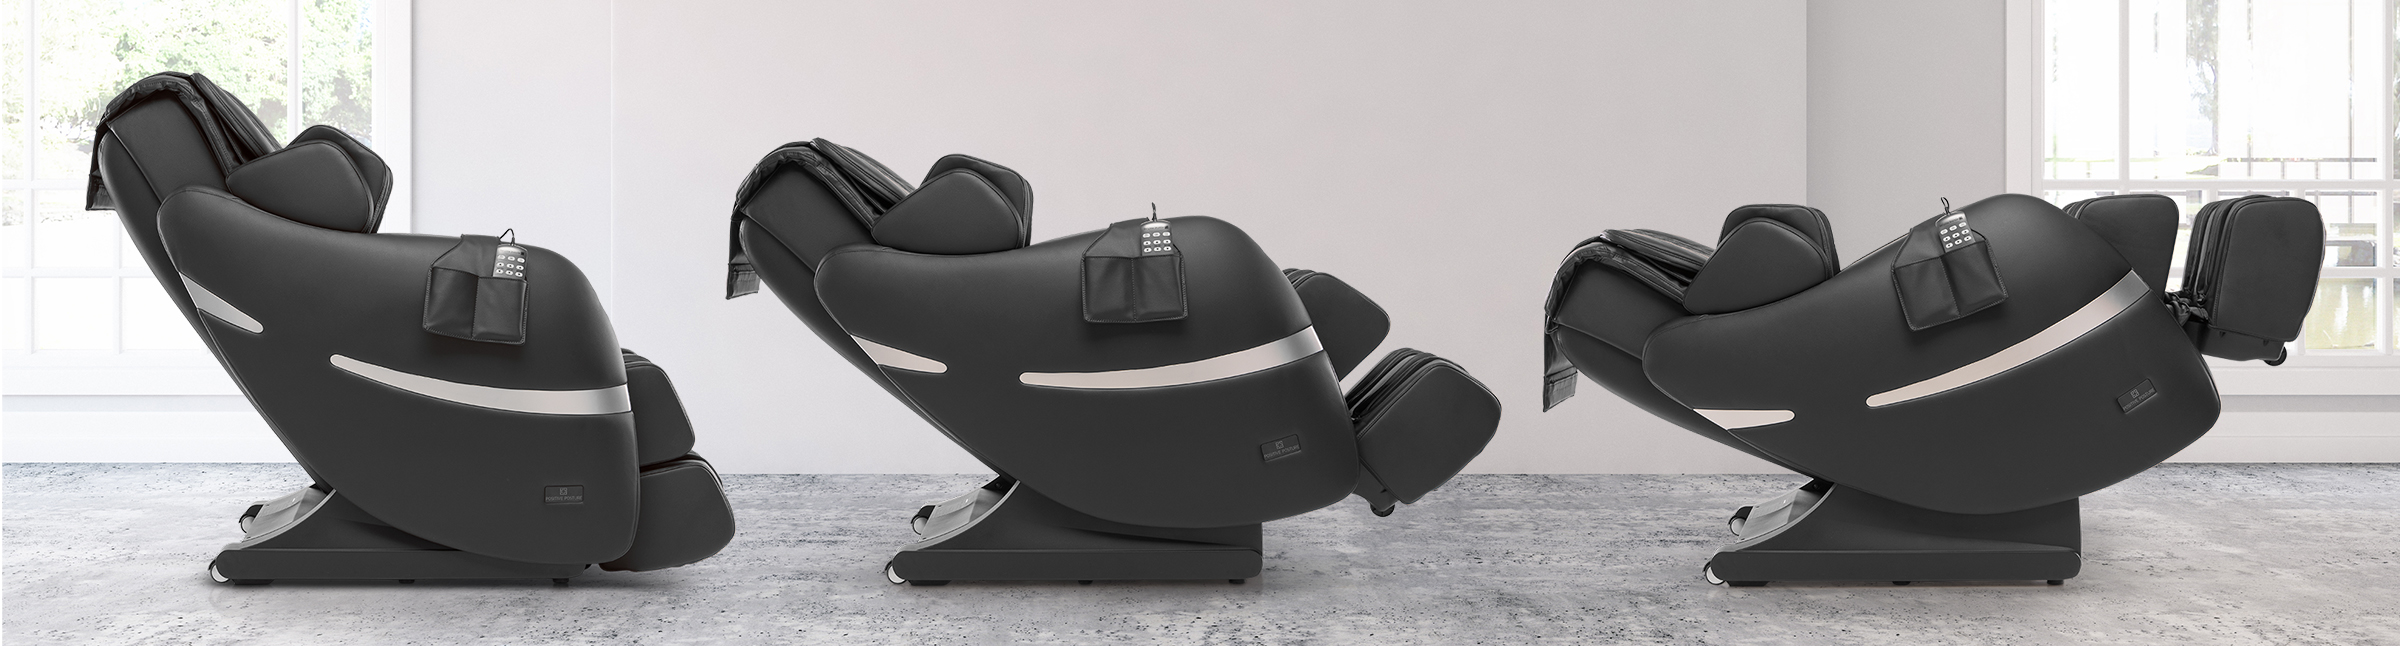 Reclining Massage Chairs